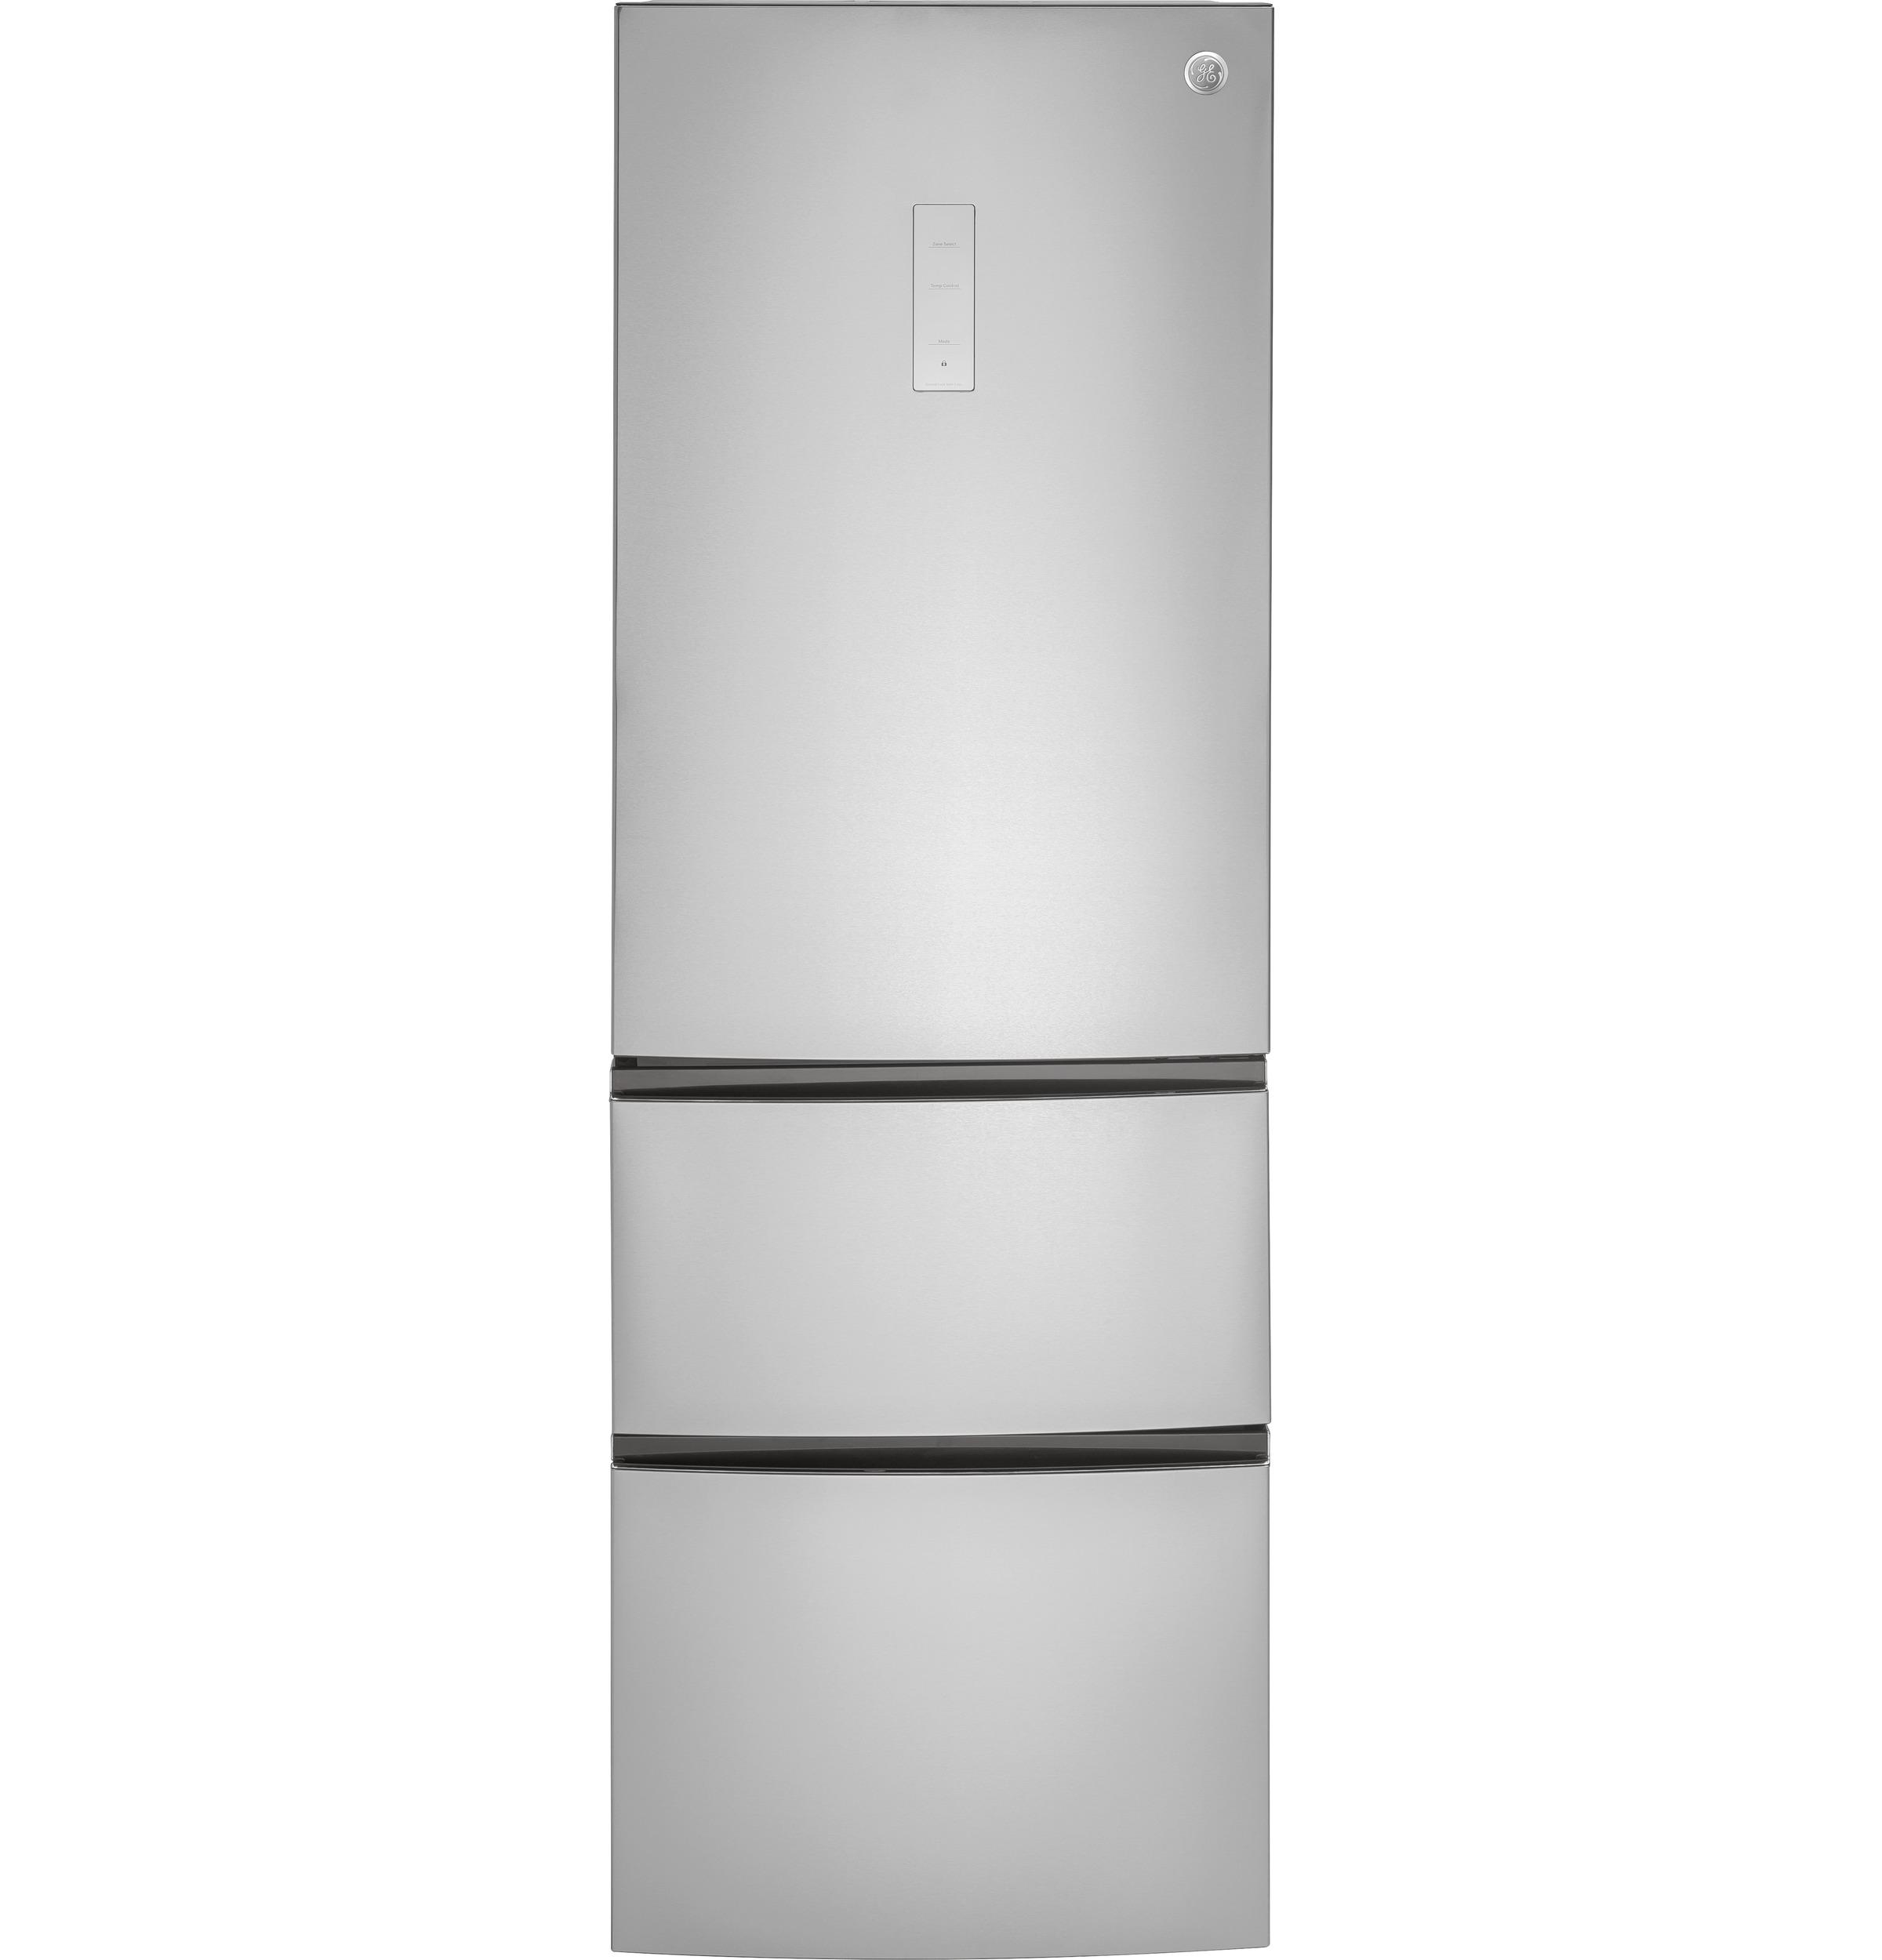 GE® GLE12HSLSS 11.9 Cu. Ft. Bottom Freezer Counter Depth Refrigerator